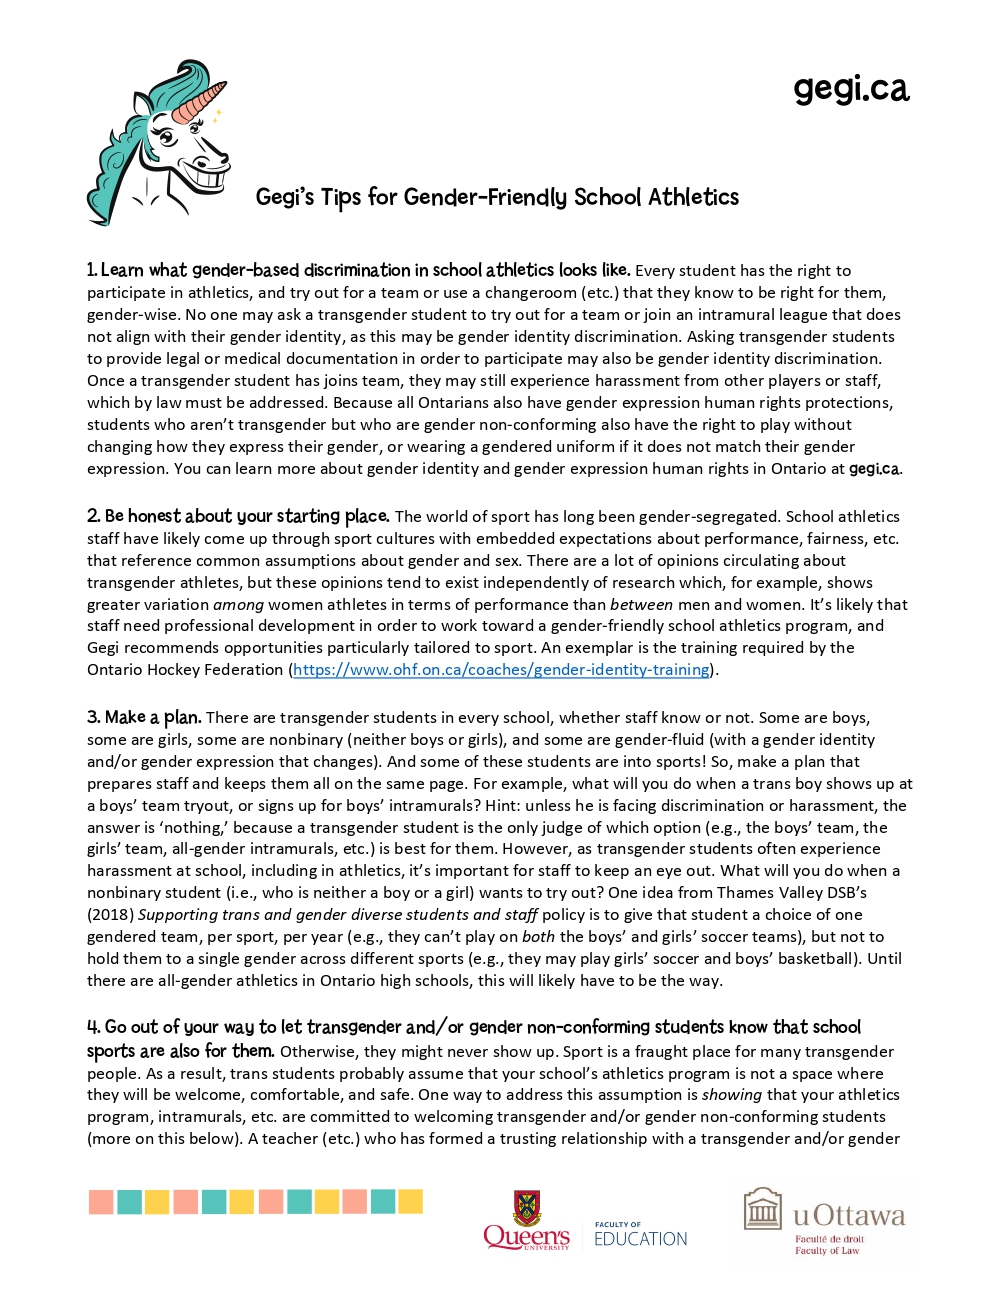 Gegi's Gender-Friendly Athletics Tips